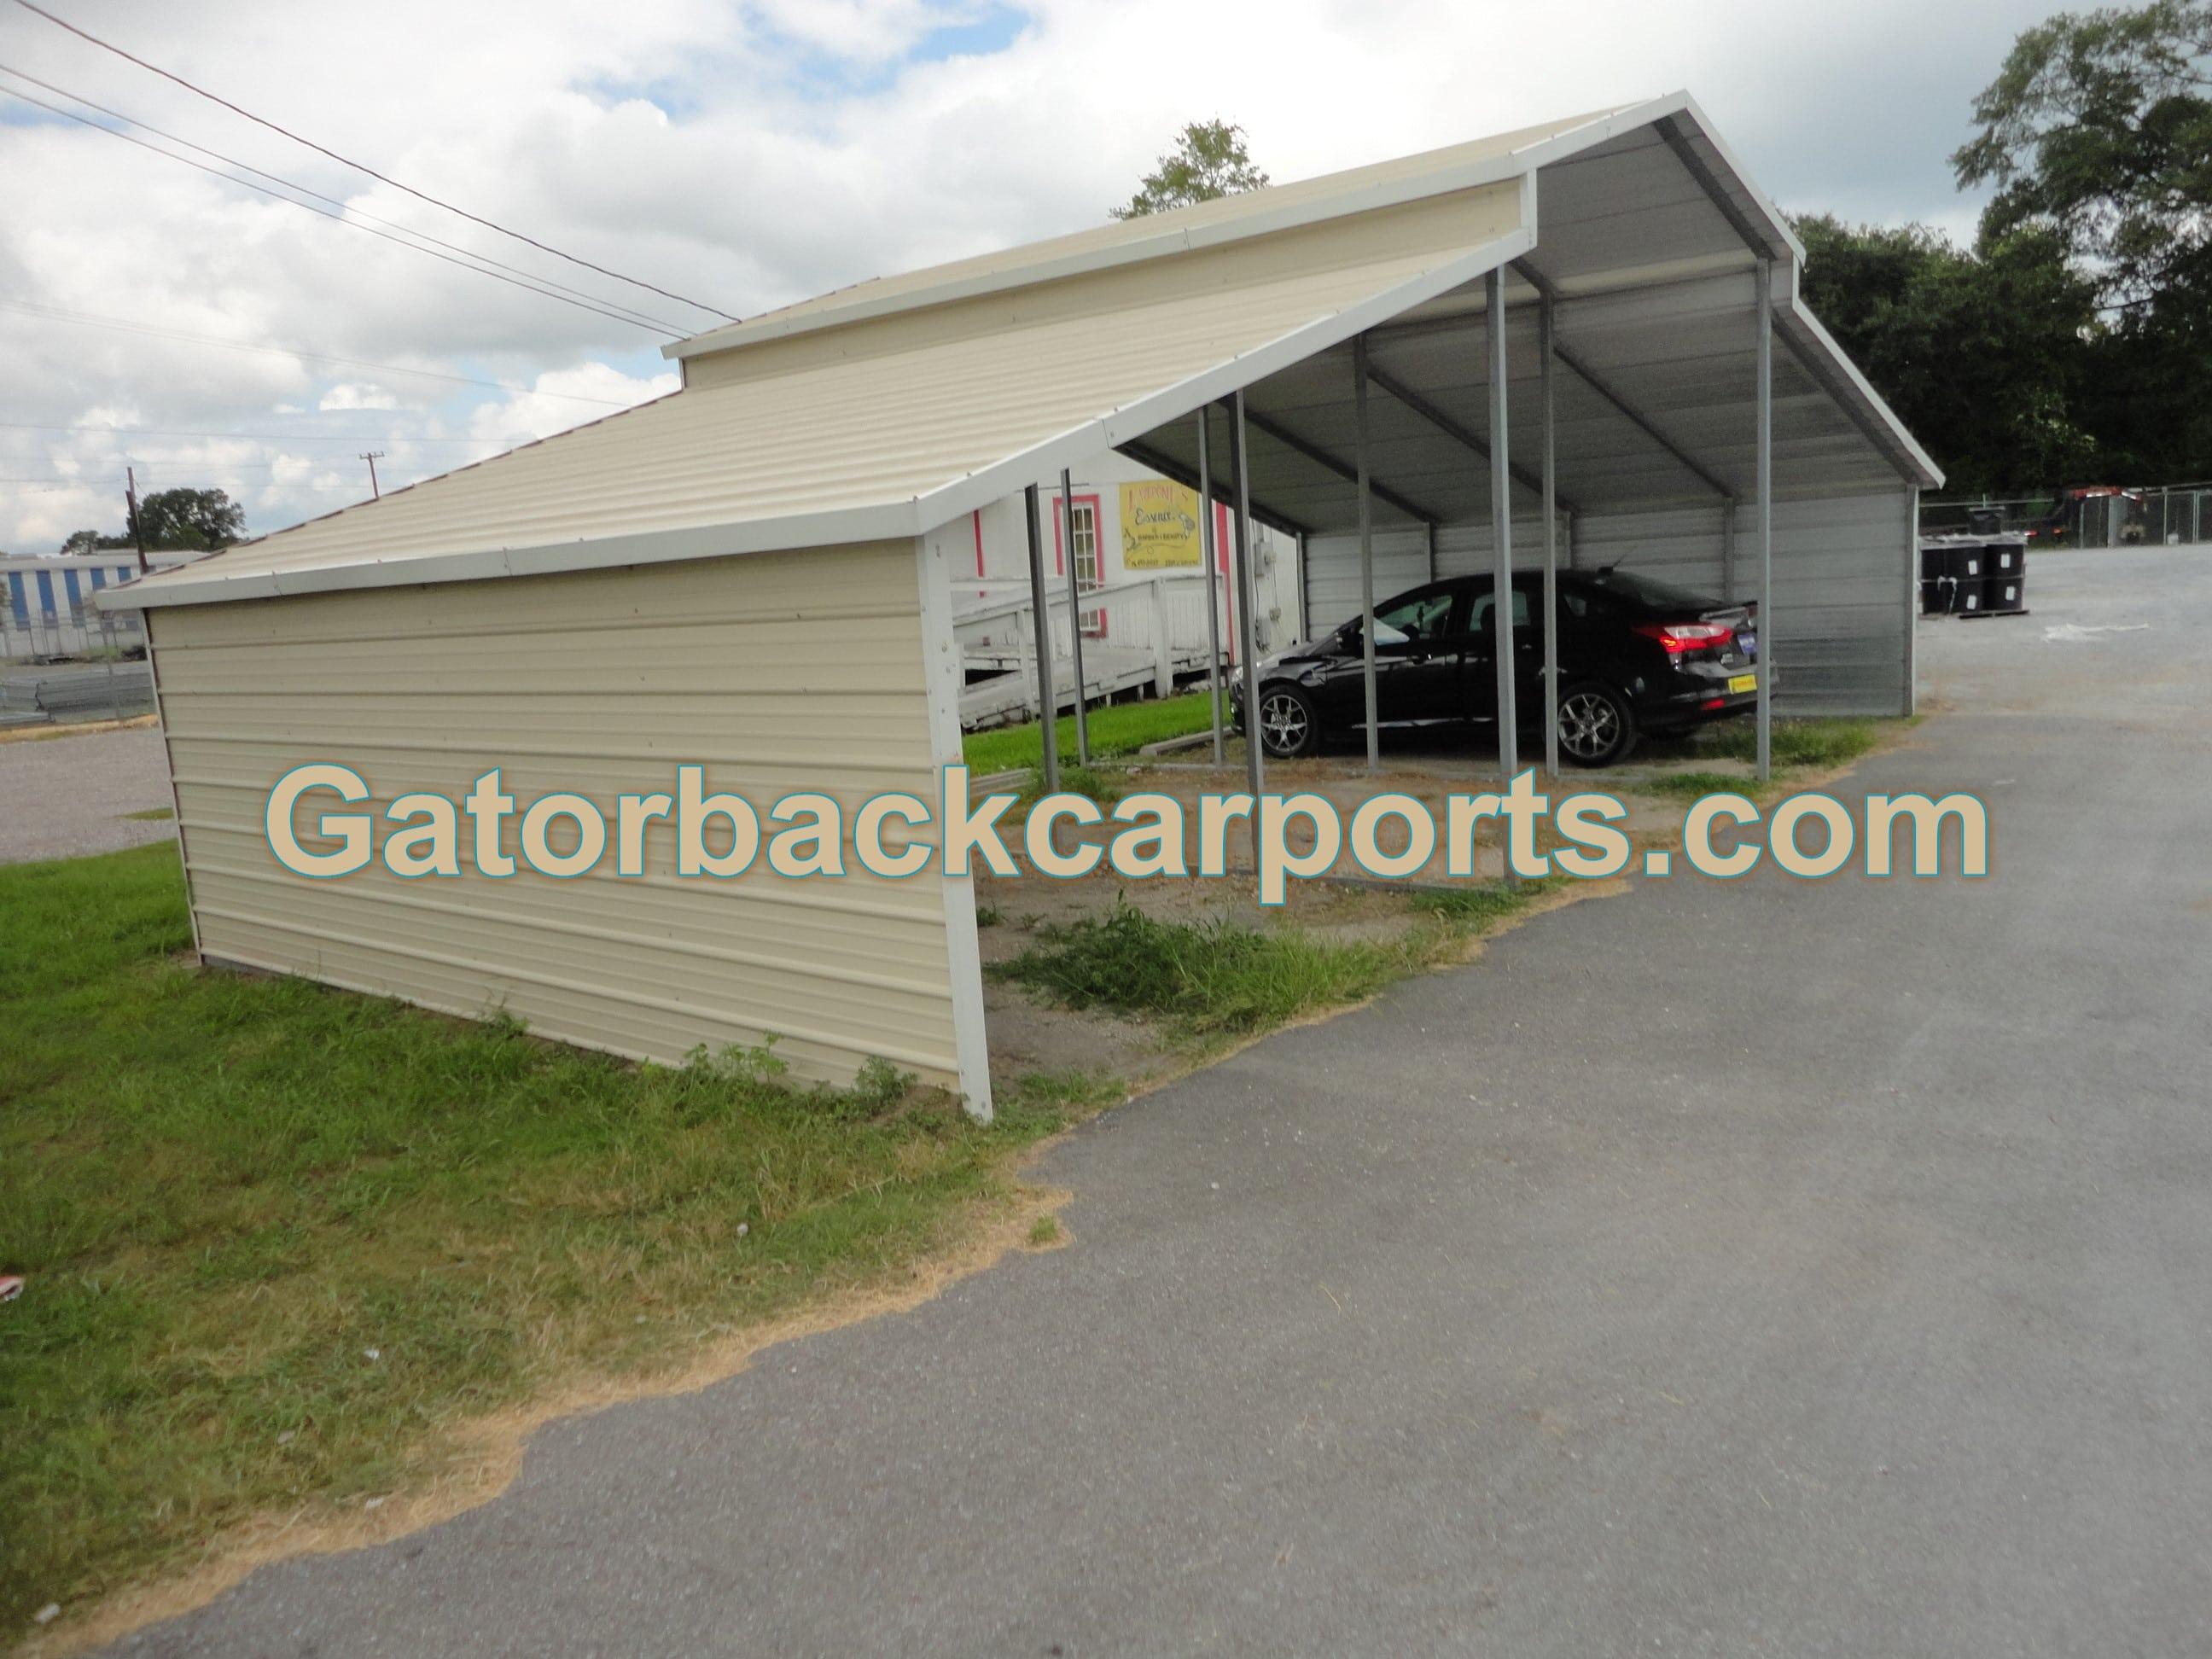 gatorback carports u2013 carport gallery